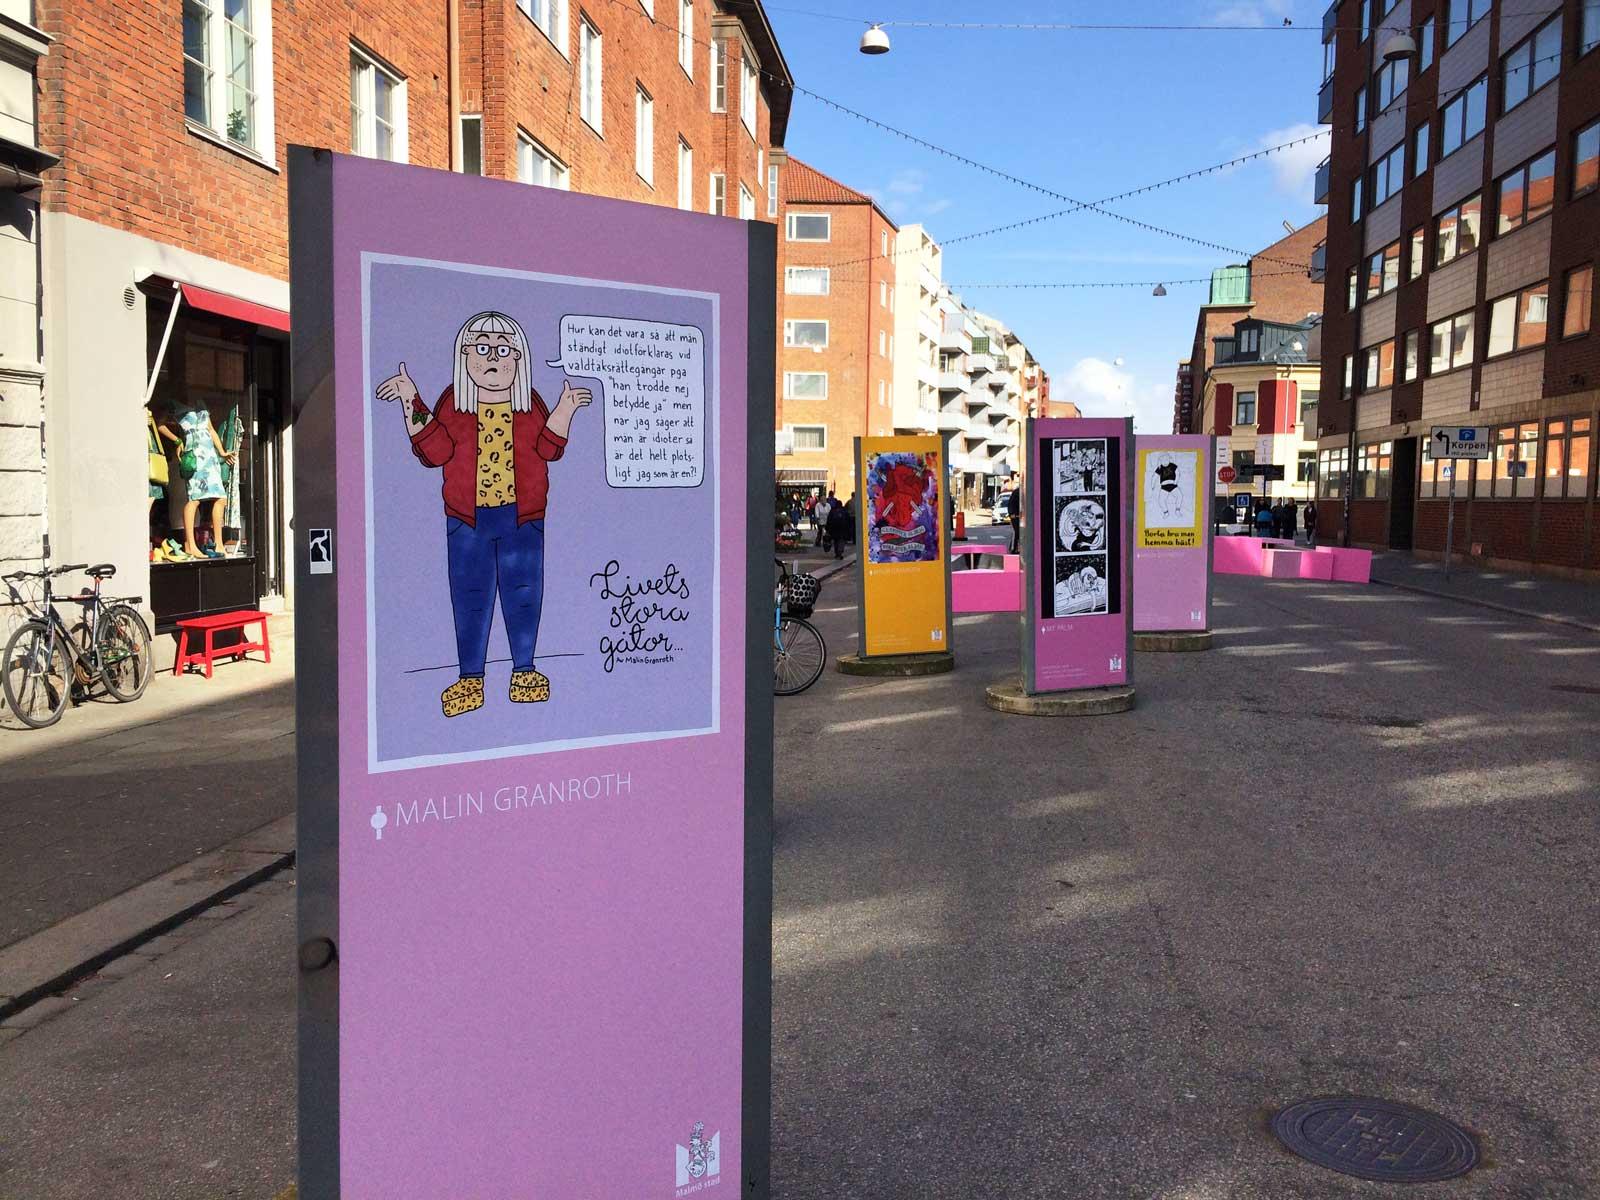 Serieskolans utställning, Friisgatan, Malmö.